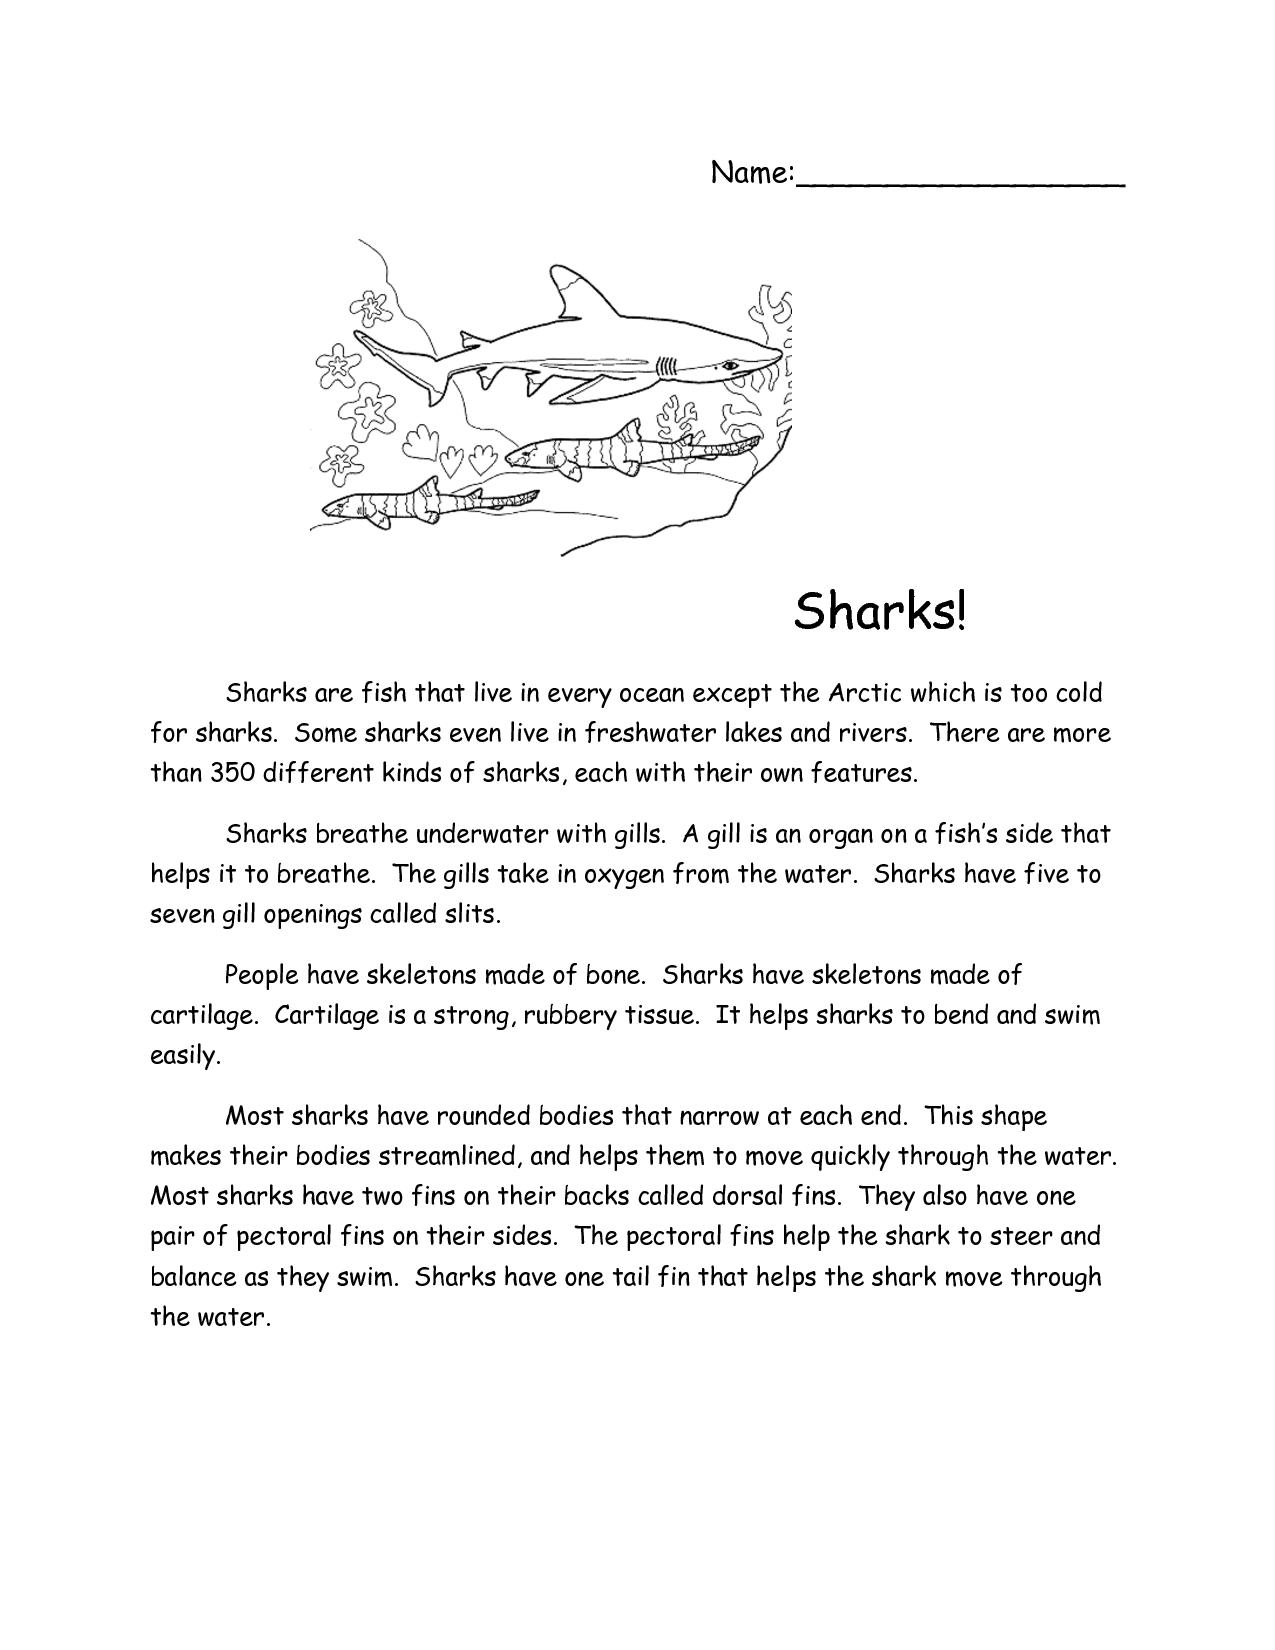 Sharks Reading Comprehension Passage